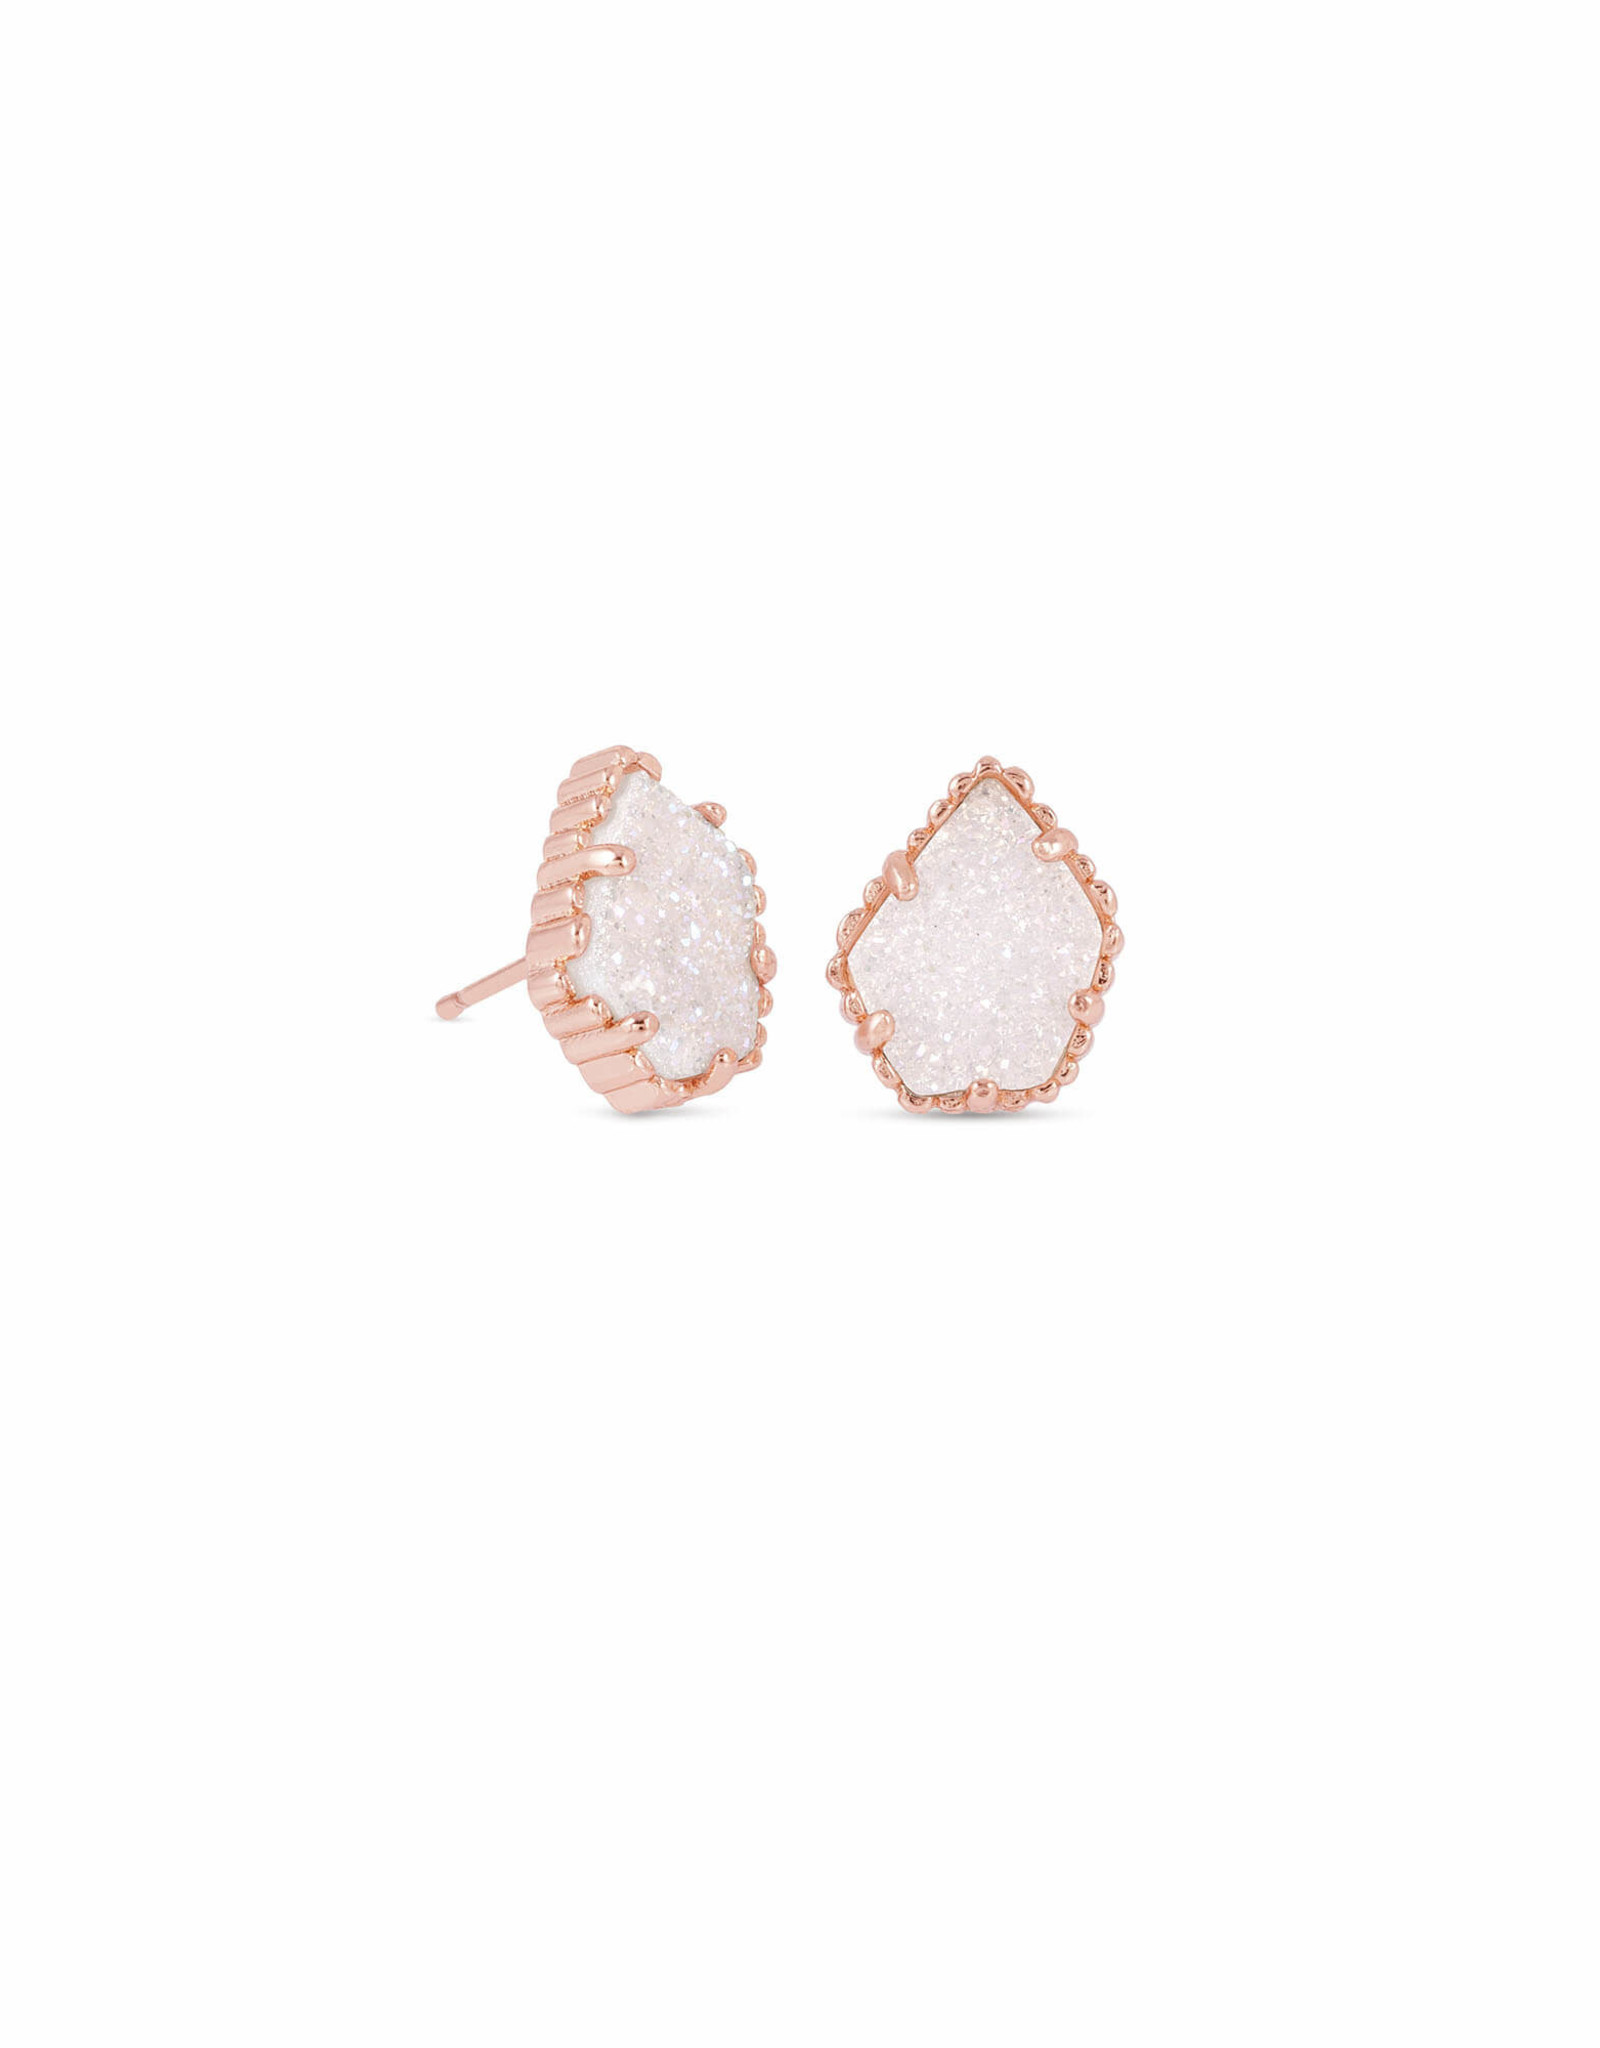 Kendra Scott Tessa Earring - Irdidescent Drusy/Rose Gold